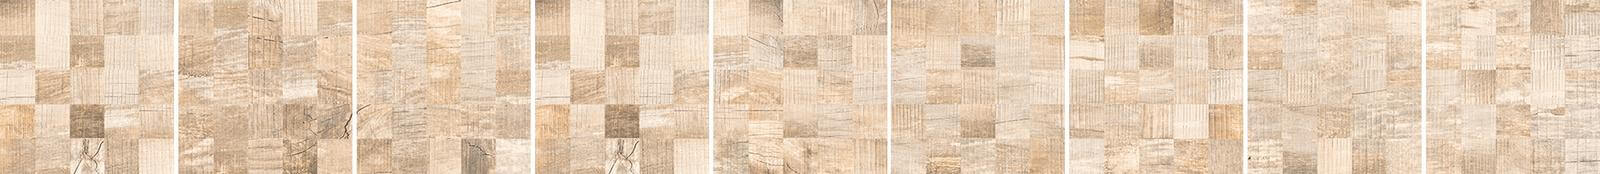 Универсальная плитка Azulindus & Marti Sabina Blanco Dados 25x25 (0,9375) peter marti baustatik grundlagen stabtragwerke flächentragwerk